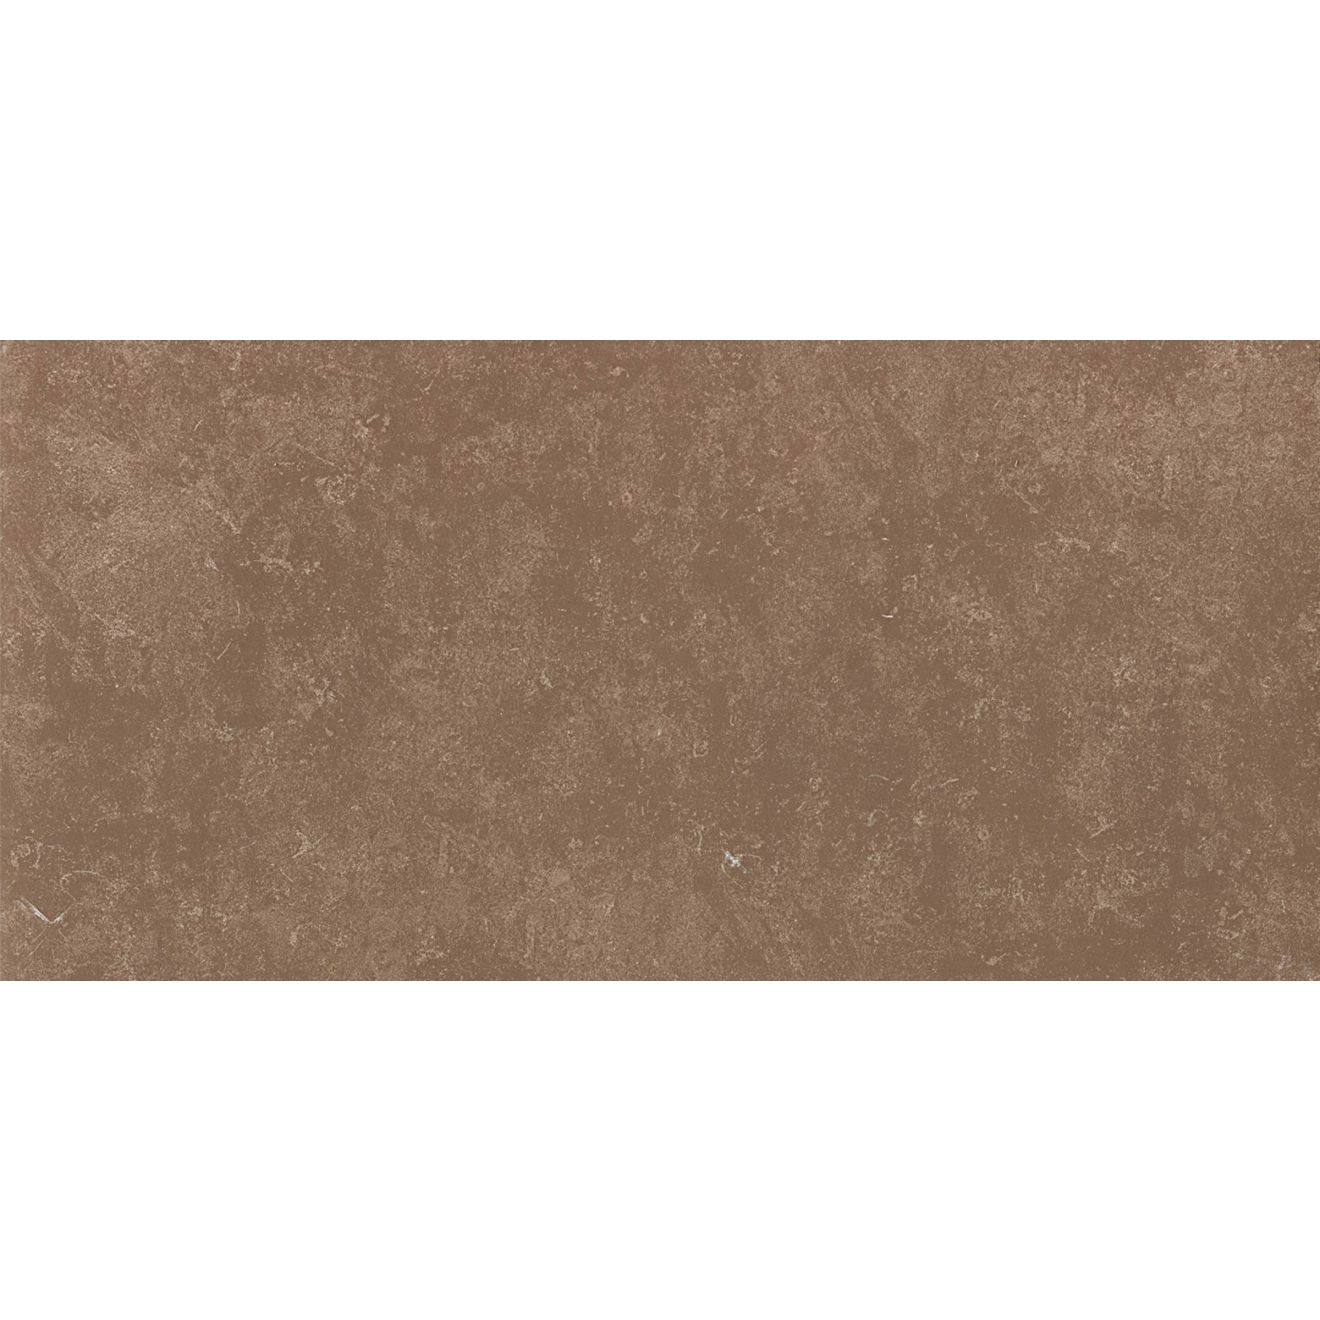 "Ararat 12""x24"" Porcelain Floor & Wall Tile in Mocha"